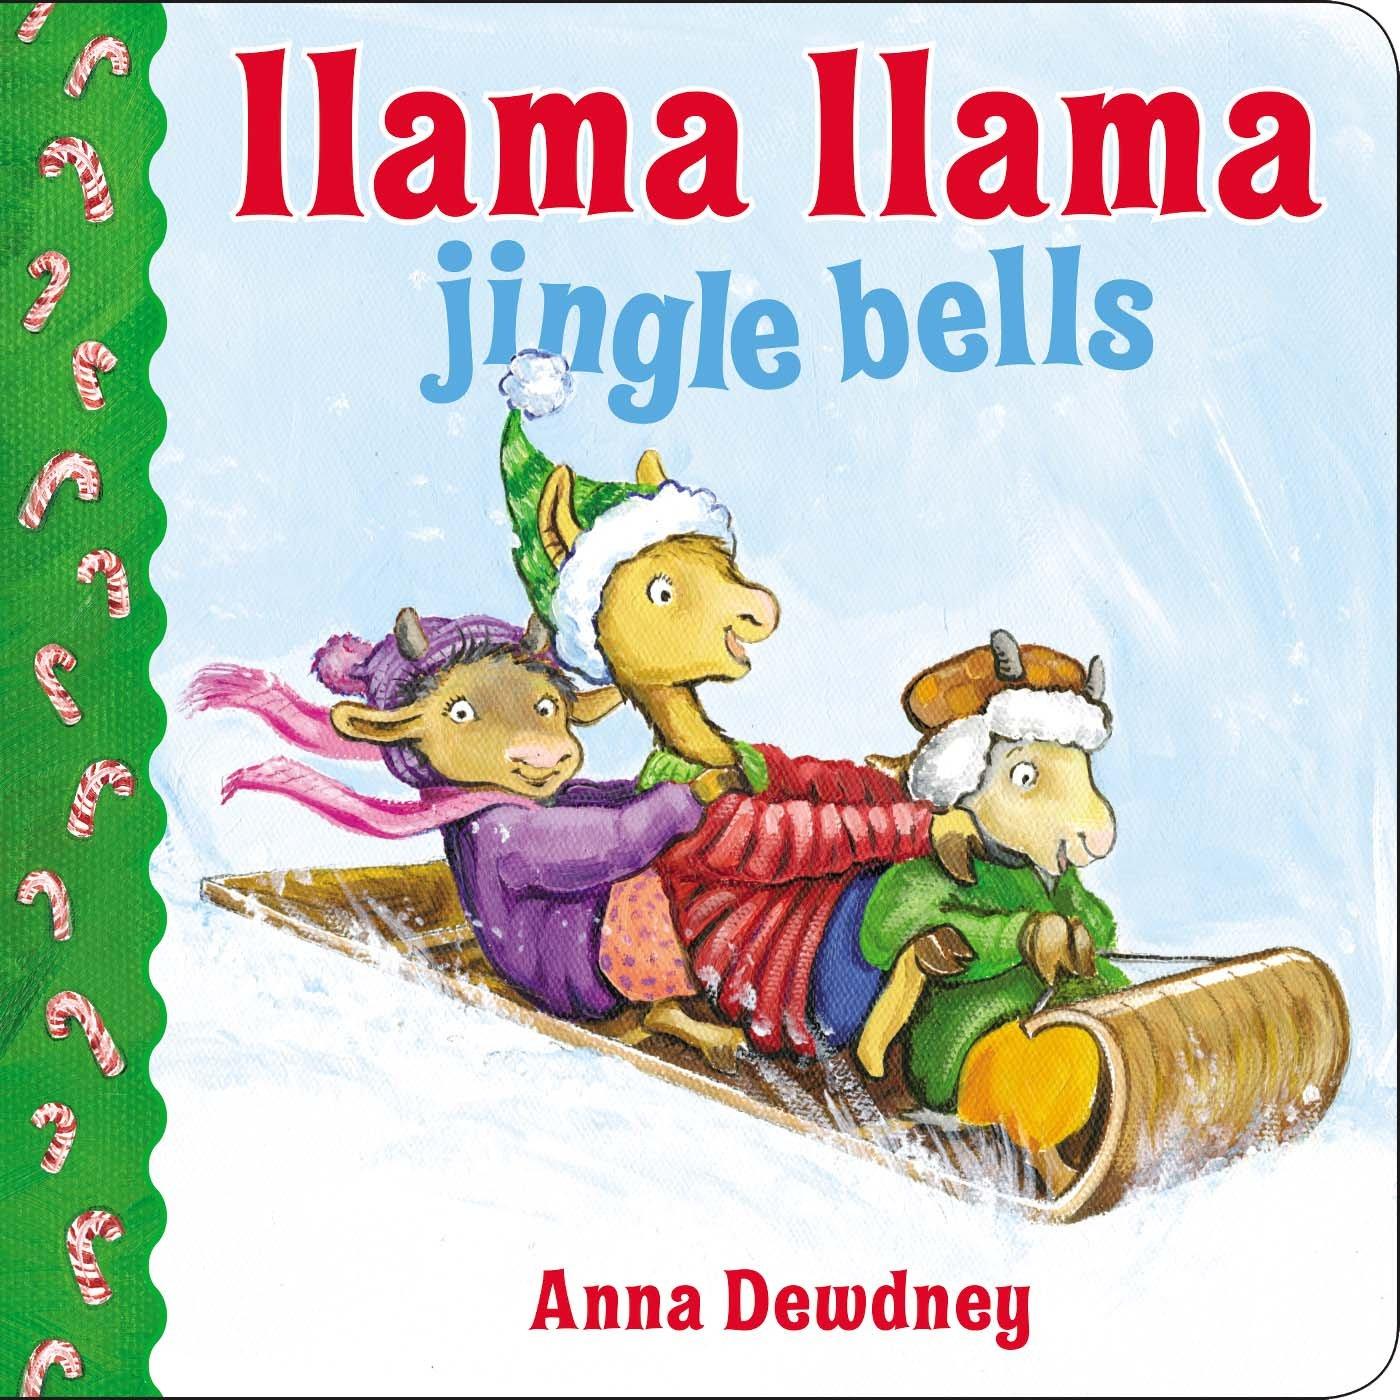 Llama Llama Jingle Bells: Anna Dewdney: 9780451469809: Amazon.com ...